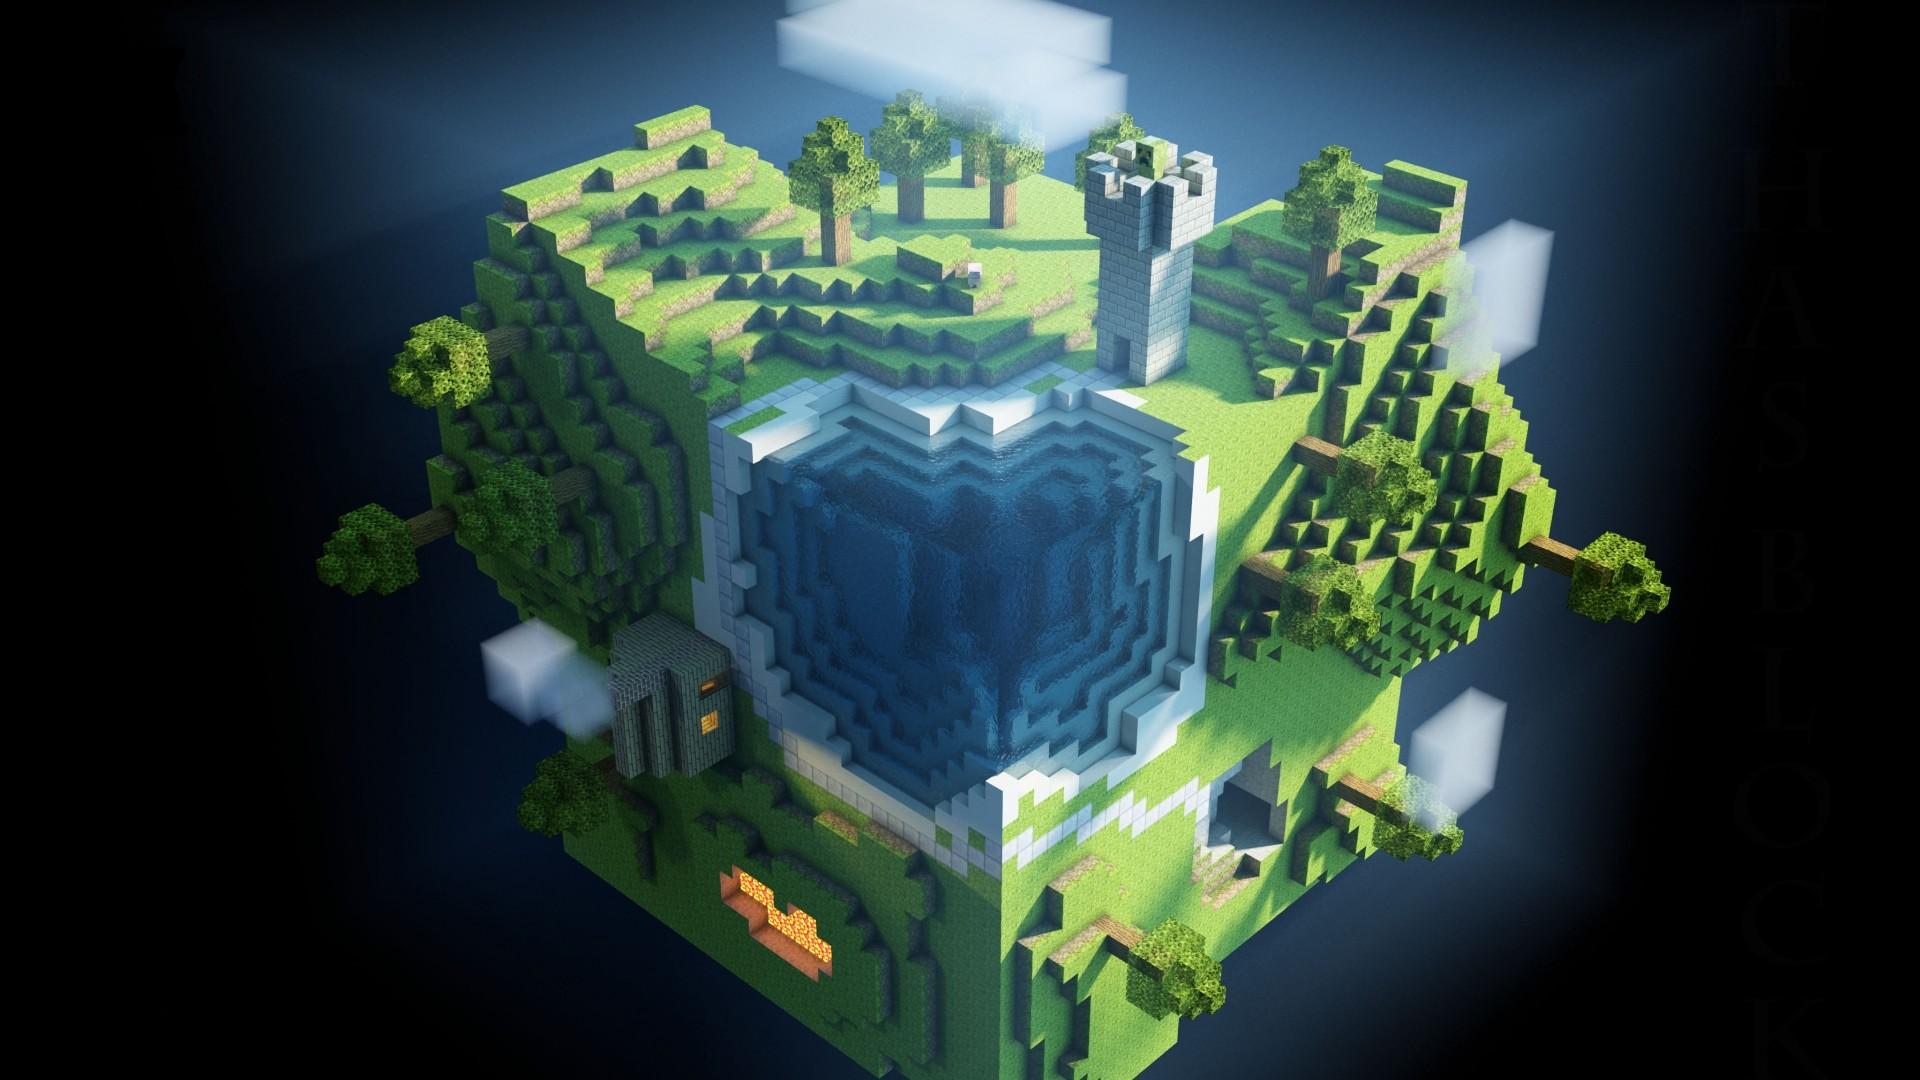 Cool Wallpaper Minecraft Windows 8 - 414249-full-size-minecraft-wallpaper-1920x1080-1920x1080-for-ipad-2  Photograph_475474.jpg